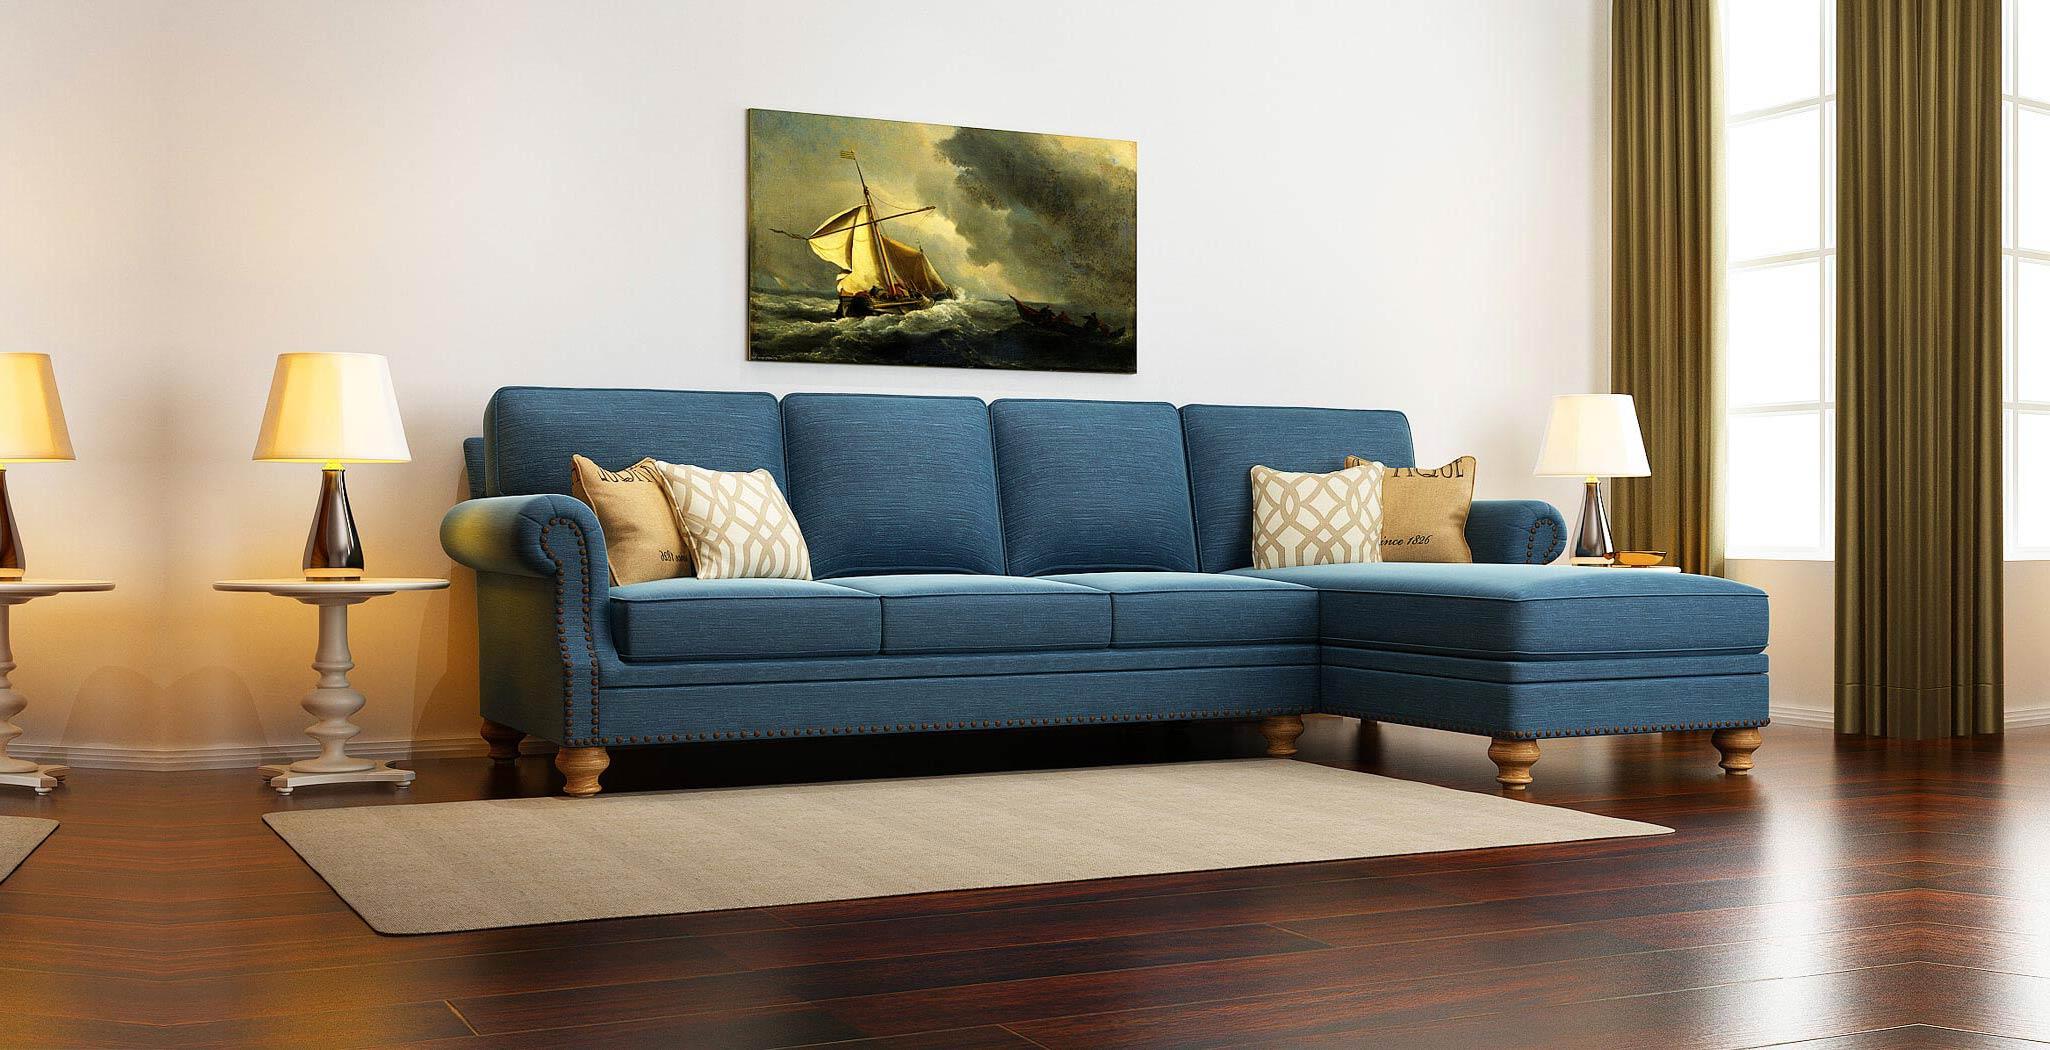 rotterdam panel furniture gallery 2